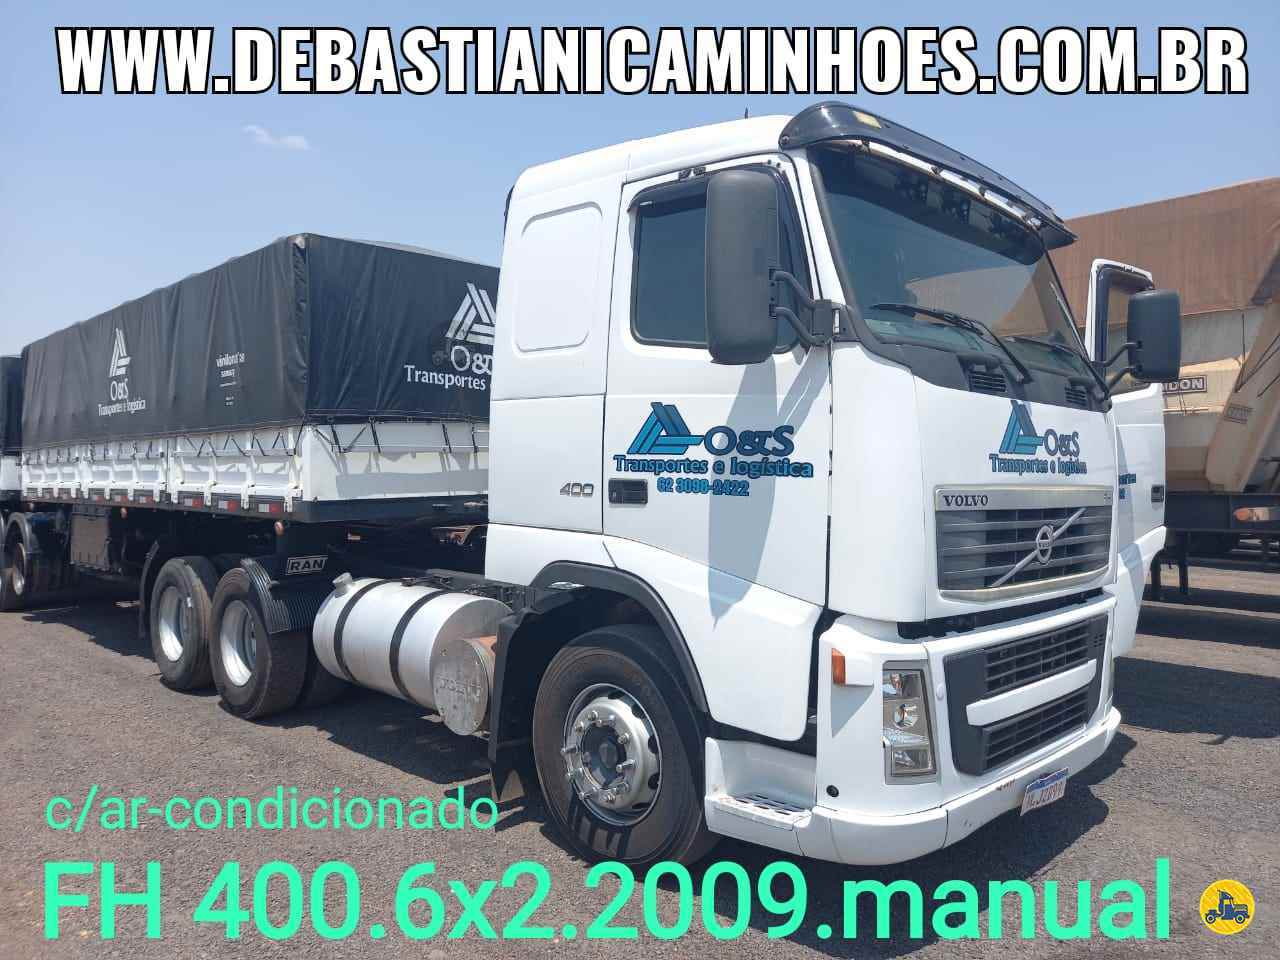 CAMINHAO VOLVO VOLVO FH 400 Cavalo Mecânico Truck 6x2 Debastiani Caminhões ANAPOLIS GOIAS GO